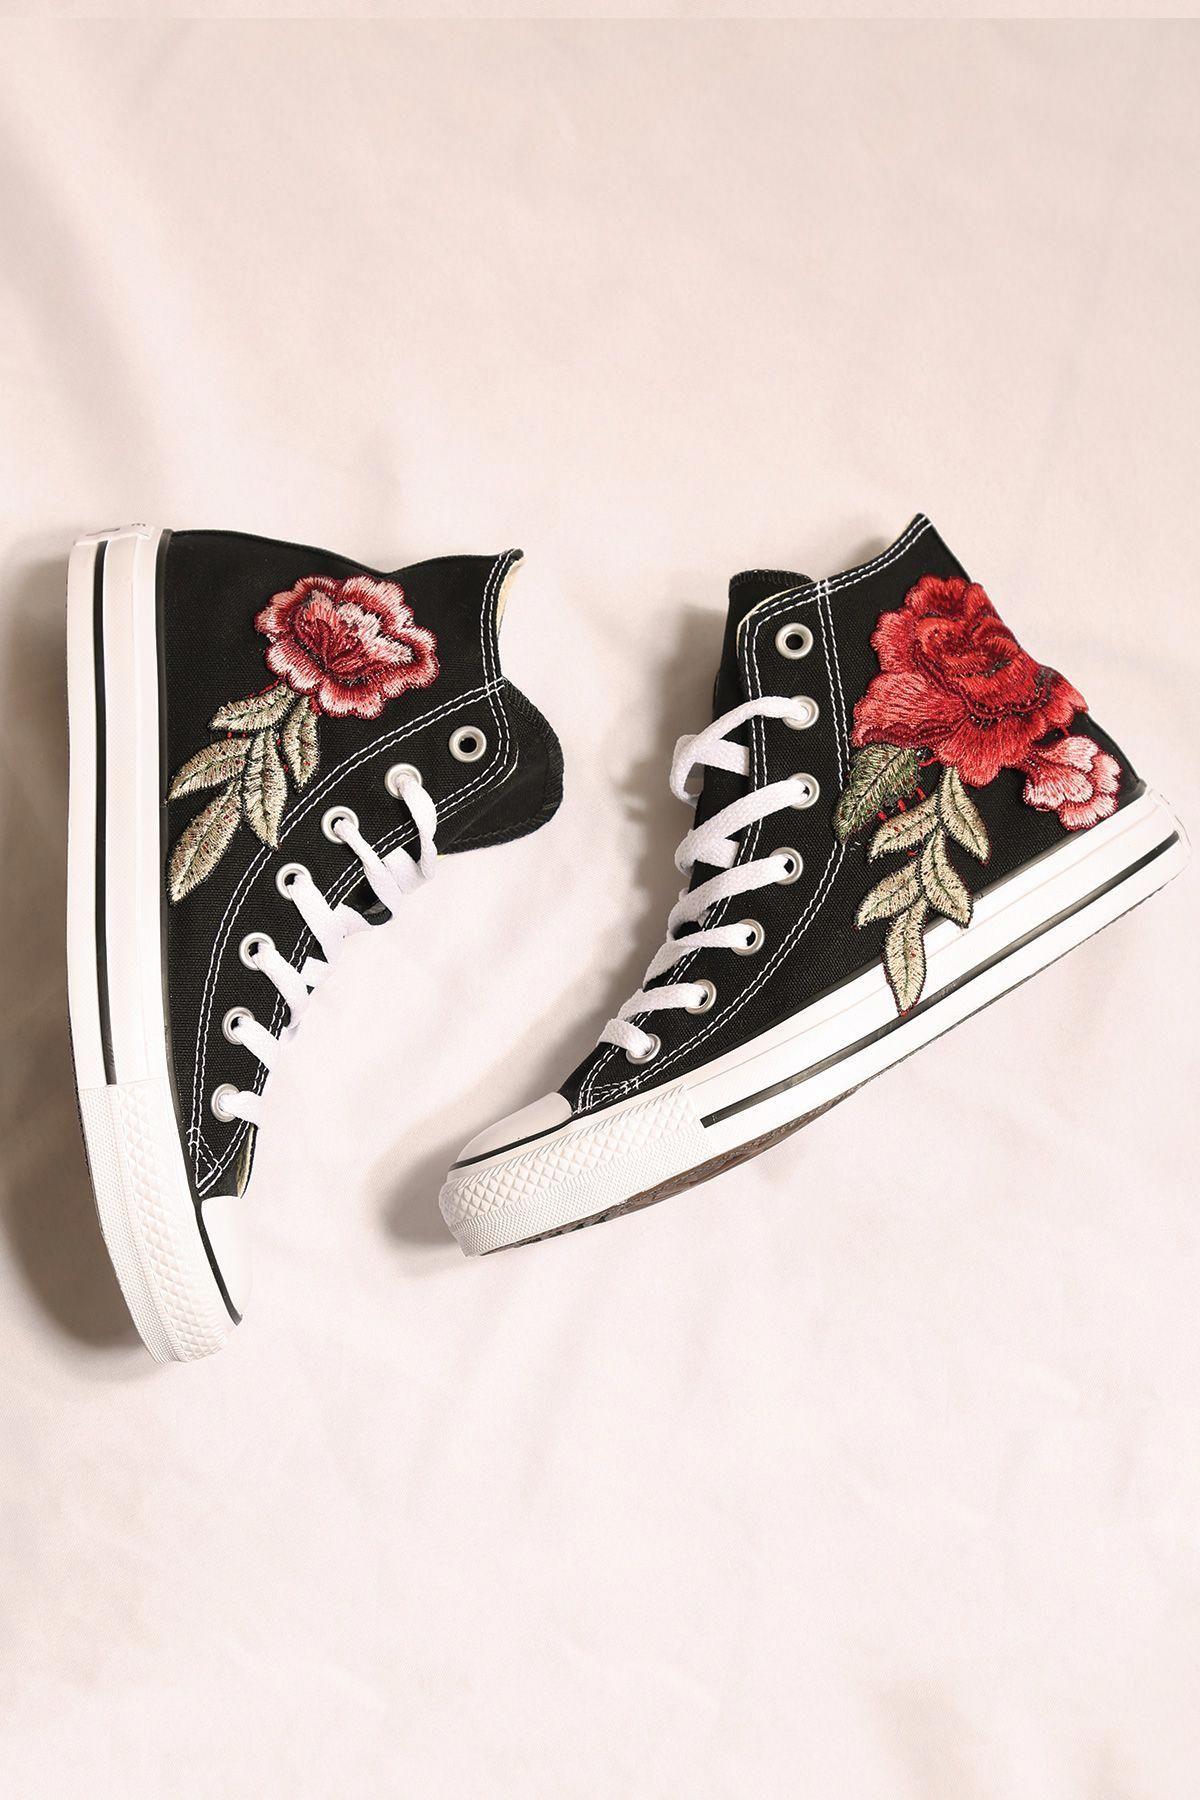 45dd0b1564fc Costom black converse rose all star high tops I size 8.5 I 80 euro   Promshoes